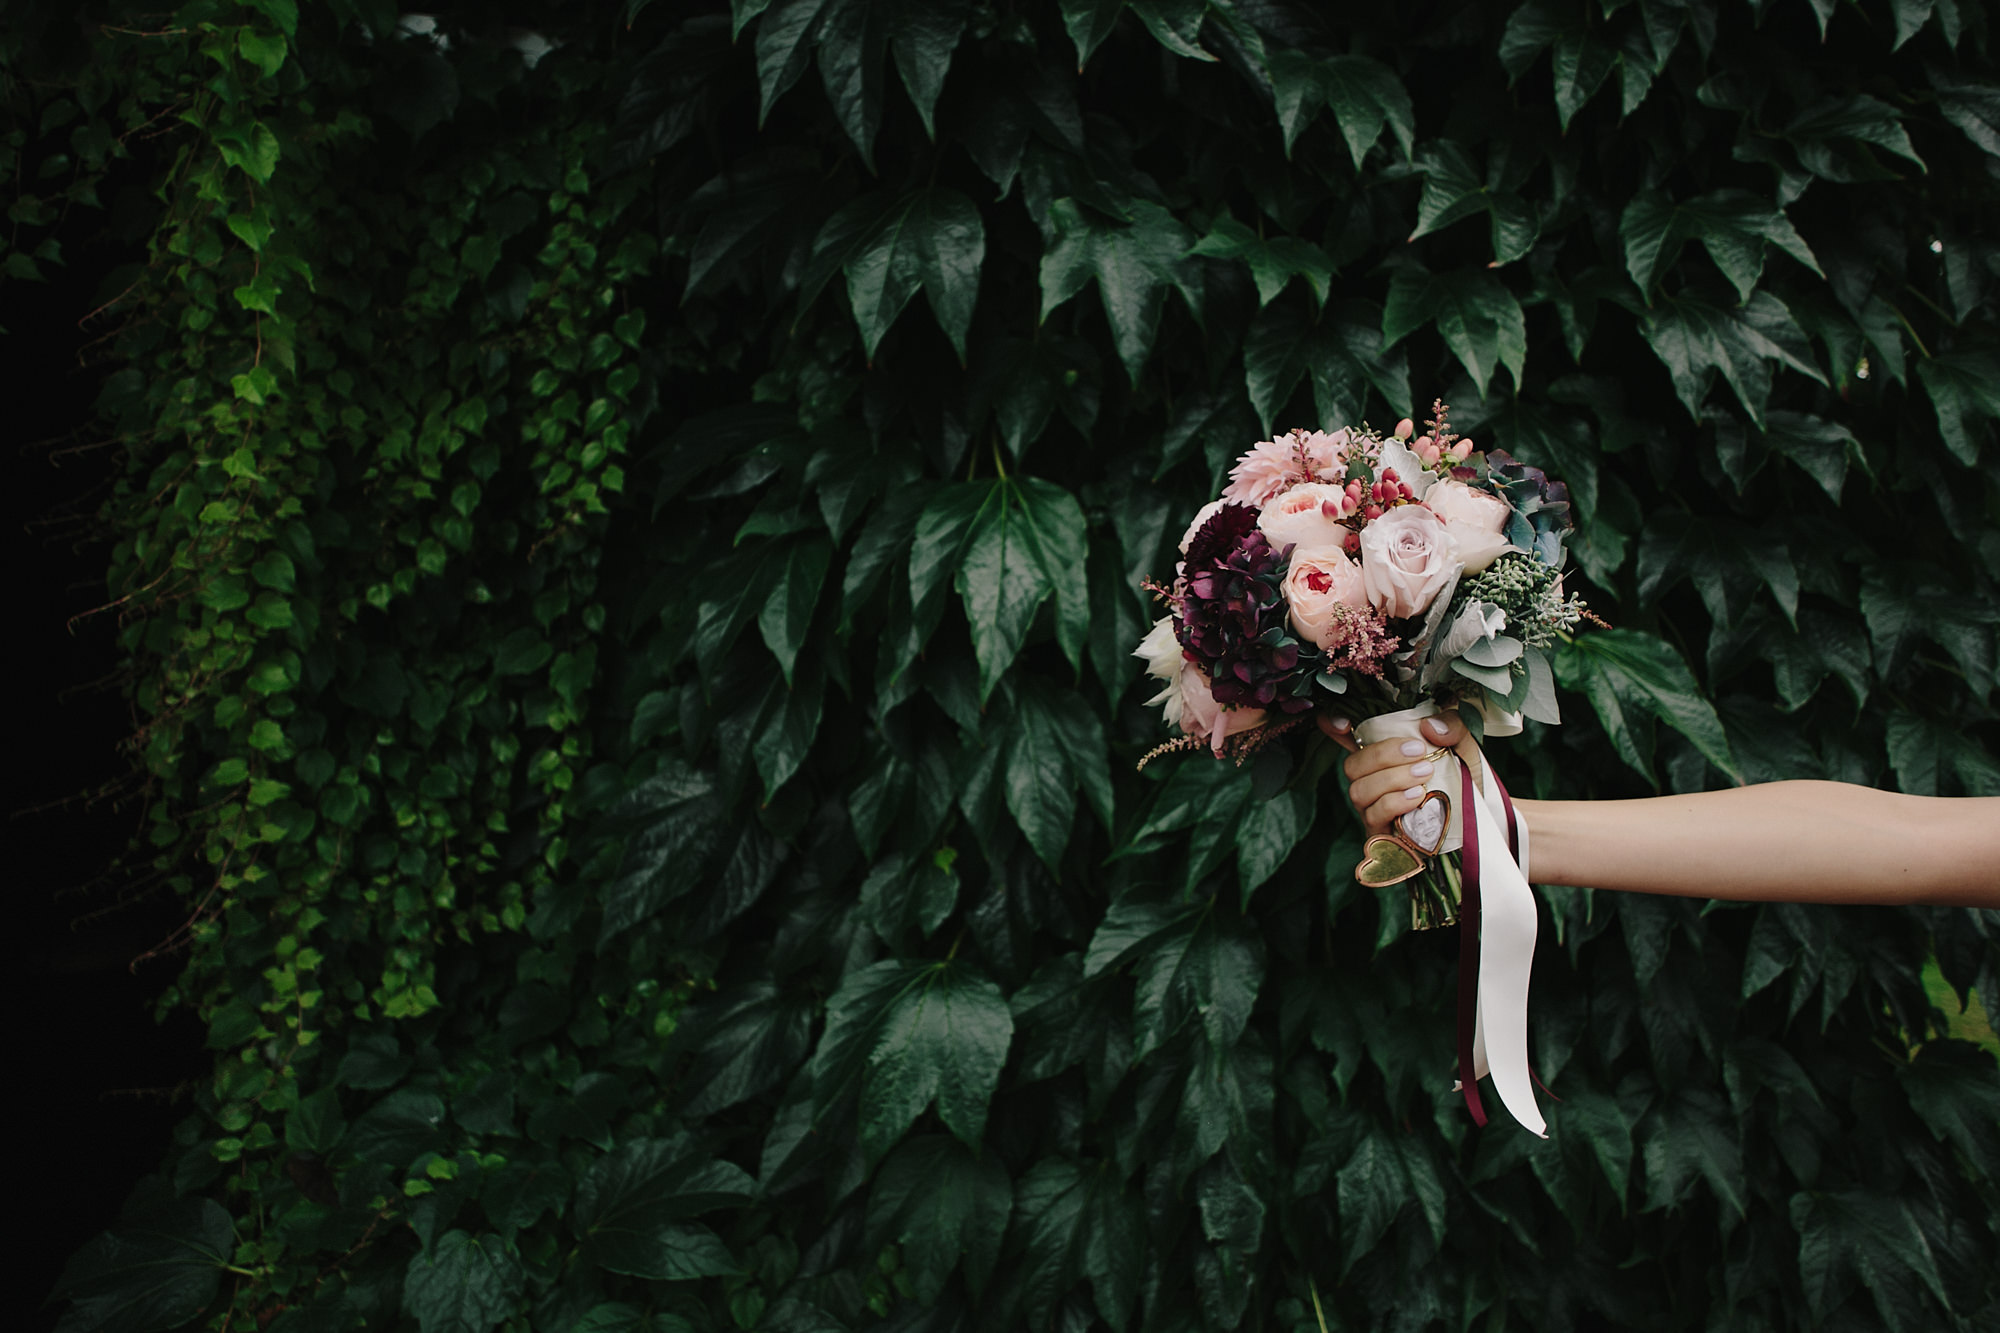 lavender-pink-purple-bouquet-with-locket-ribbons-worlds-best-wedding-photos-james-moes-missouri-wedding-photographers